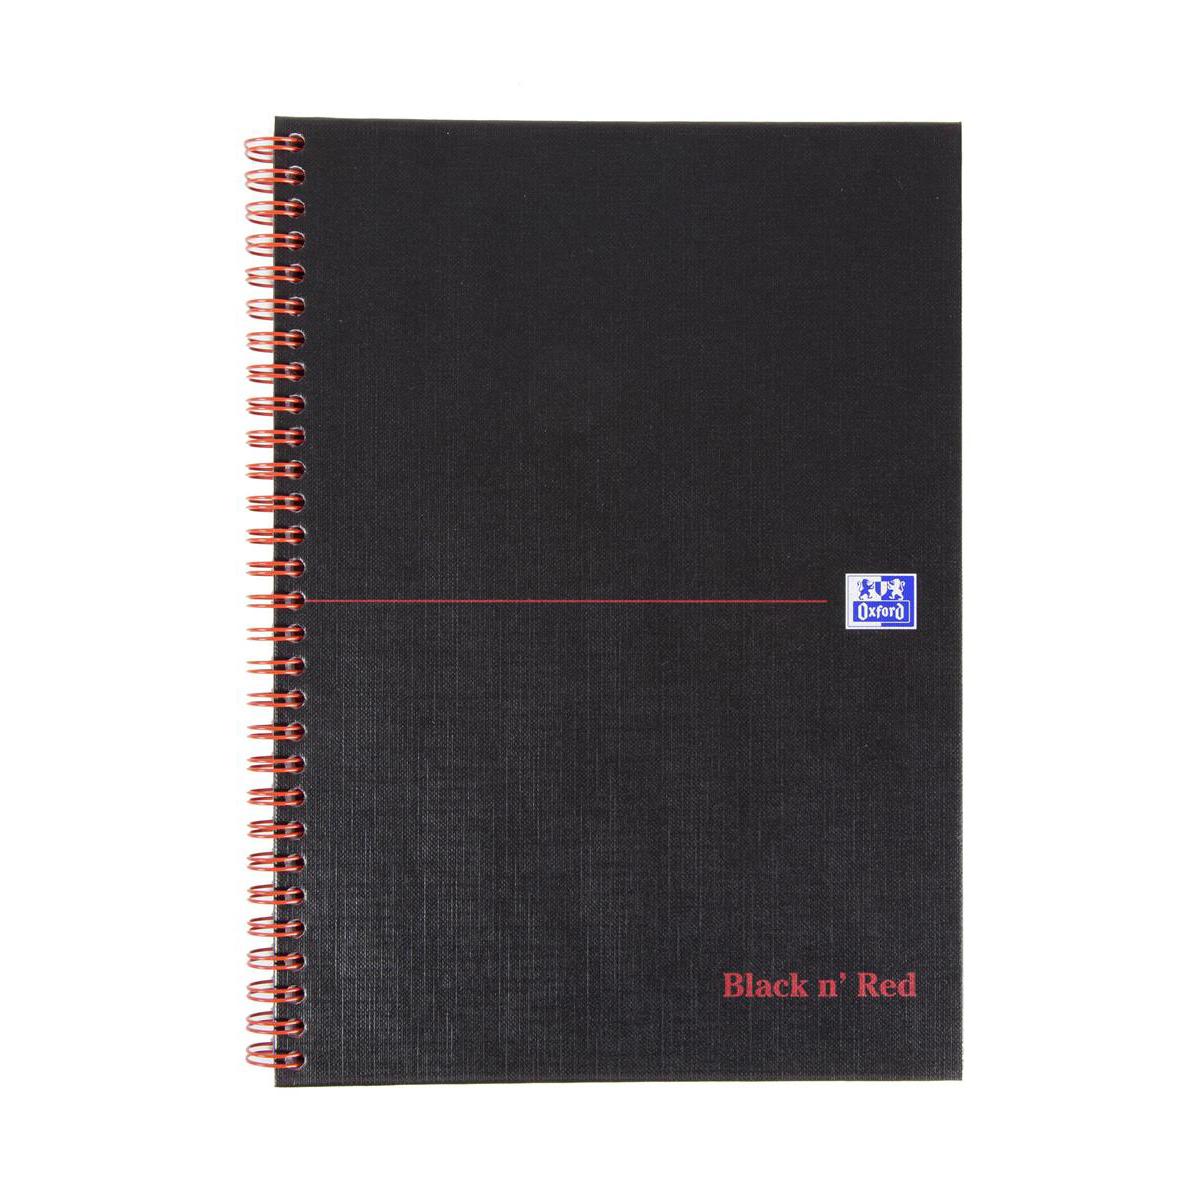 Black n Red Book Hard Back Cover Twin Wirebound 90gsm 140pp B5 FREE Coffee Jan-Feb 2019